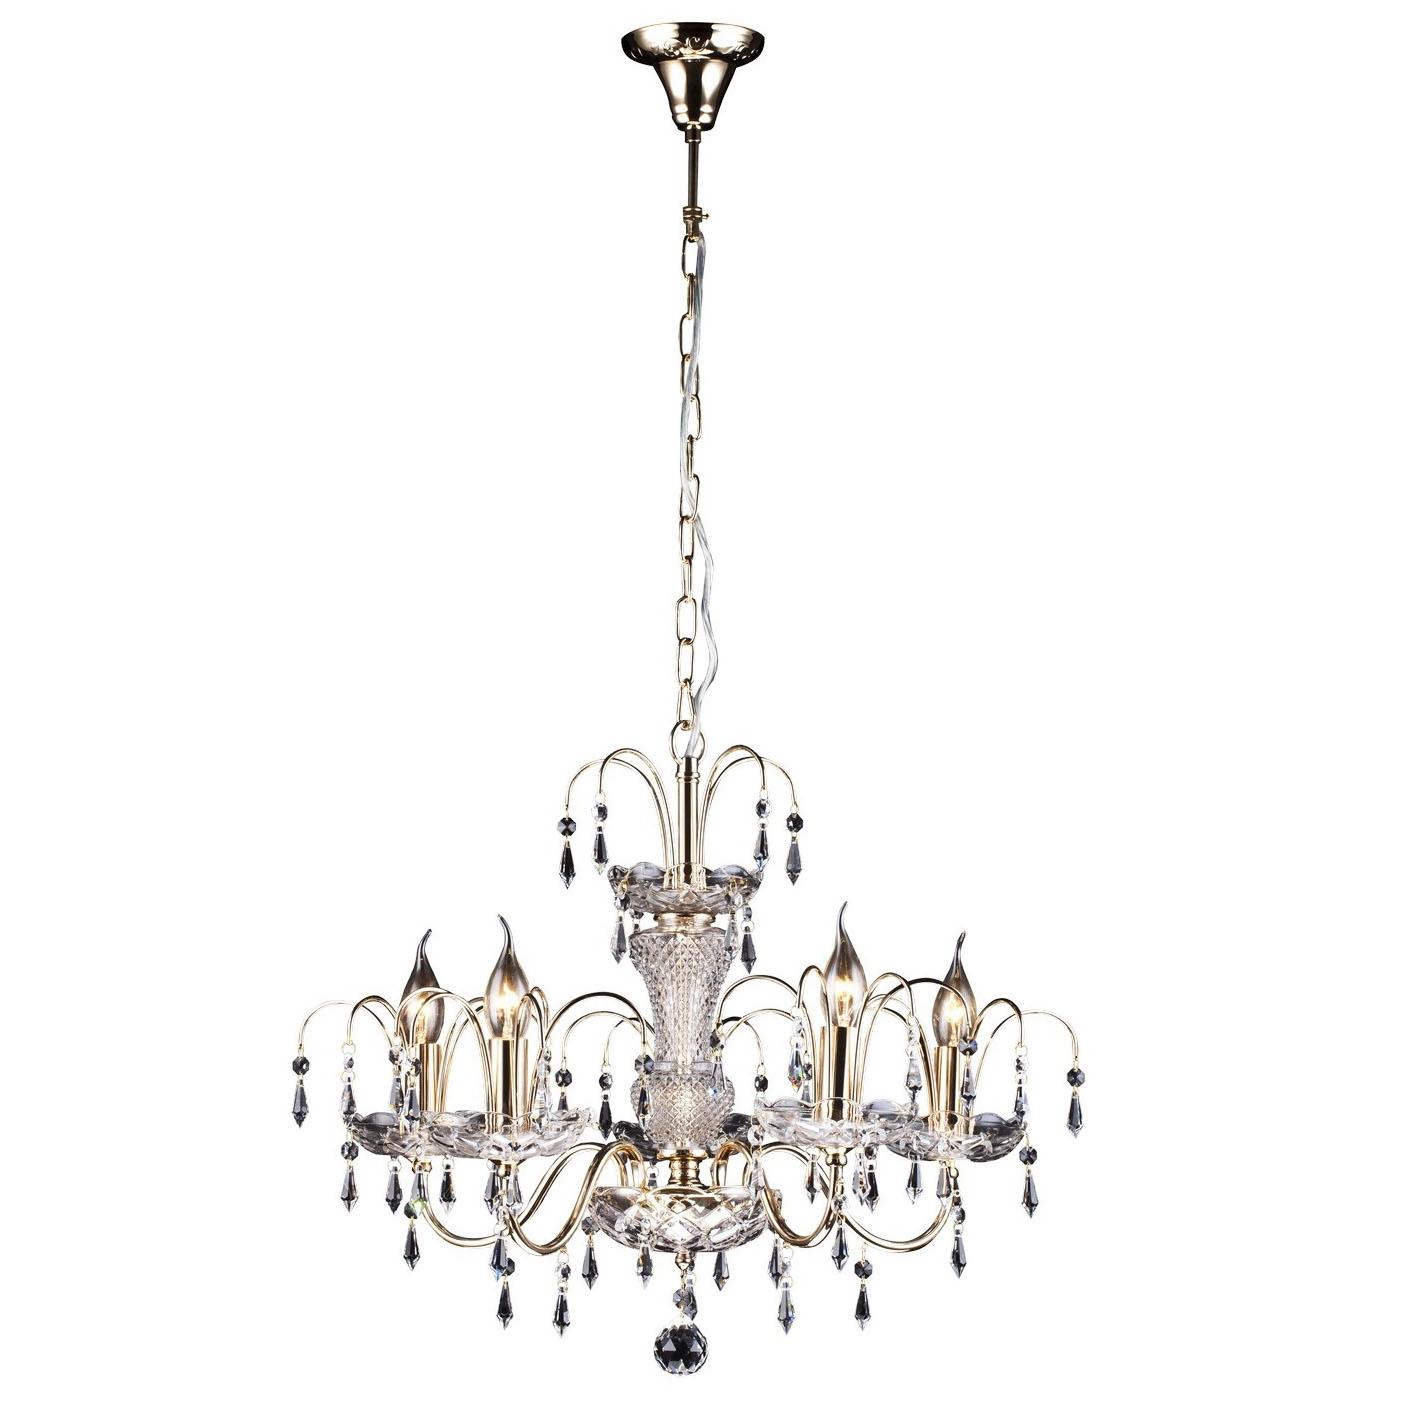 Люстра Arte lamp Sparkles a3054lm-5go люстра arte lamp sparkles a3054lm 8go